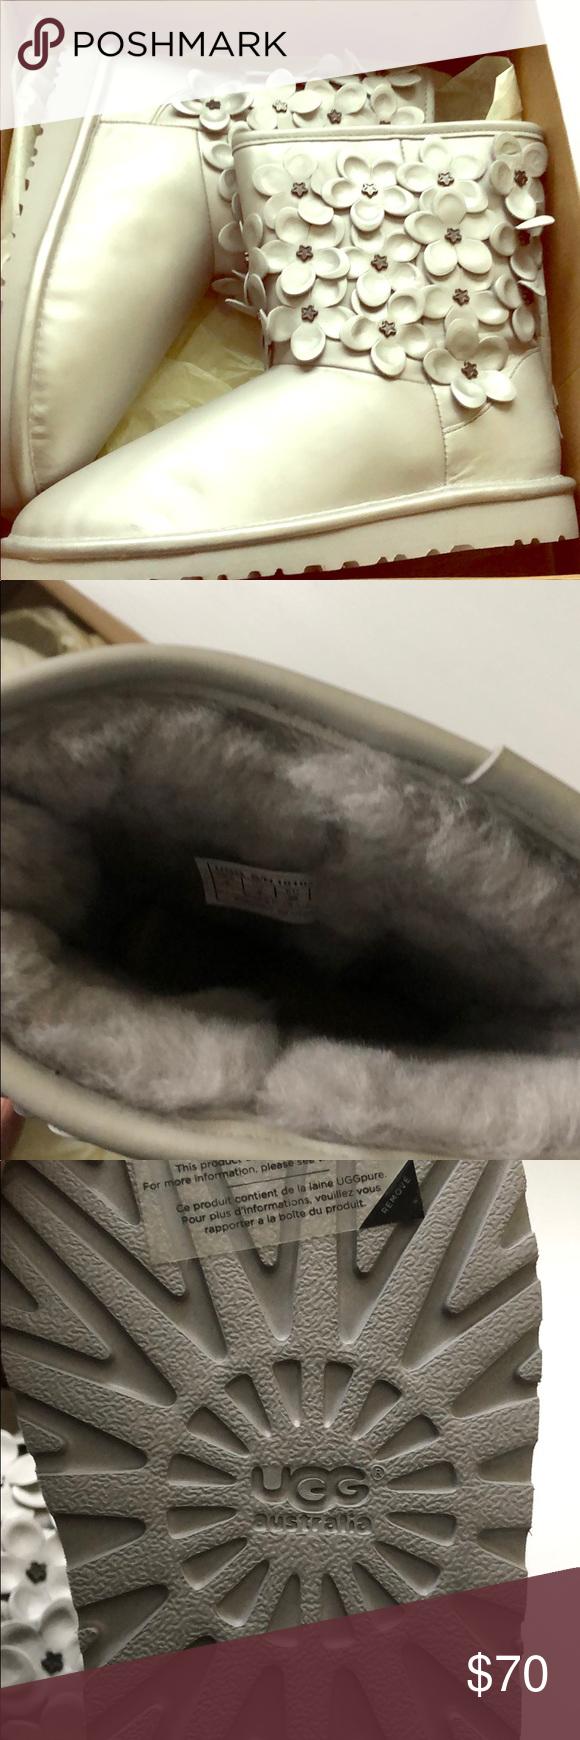 8c63bd98640 Women's Ugg Boots Flower Sterling Brand New Women's Ugg Boots B ...